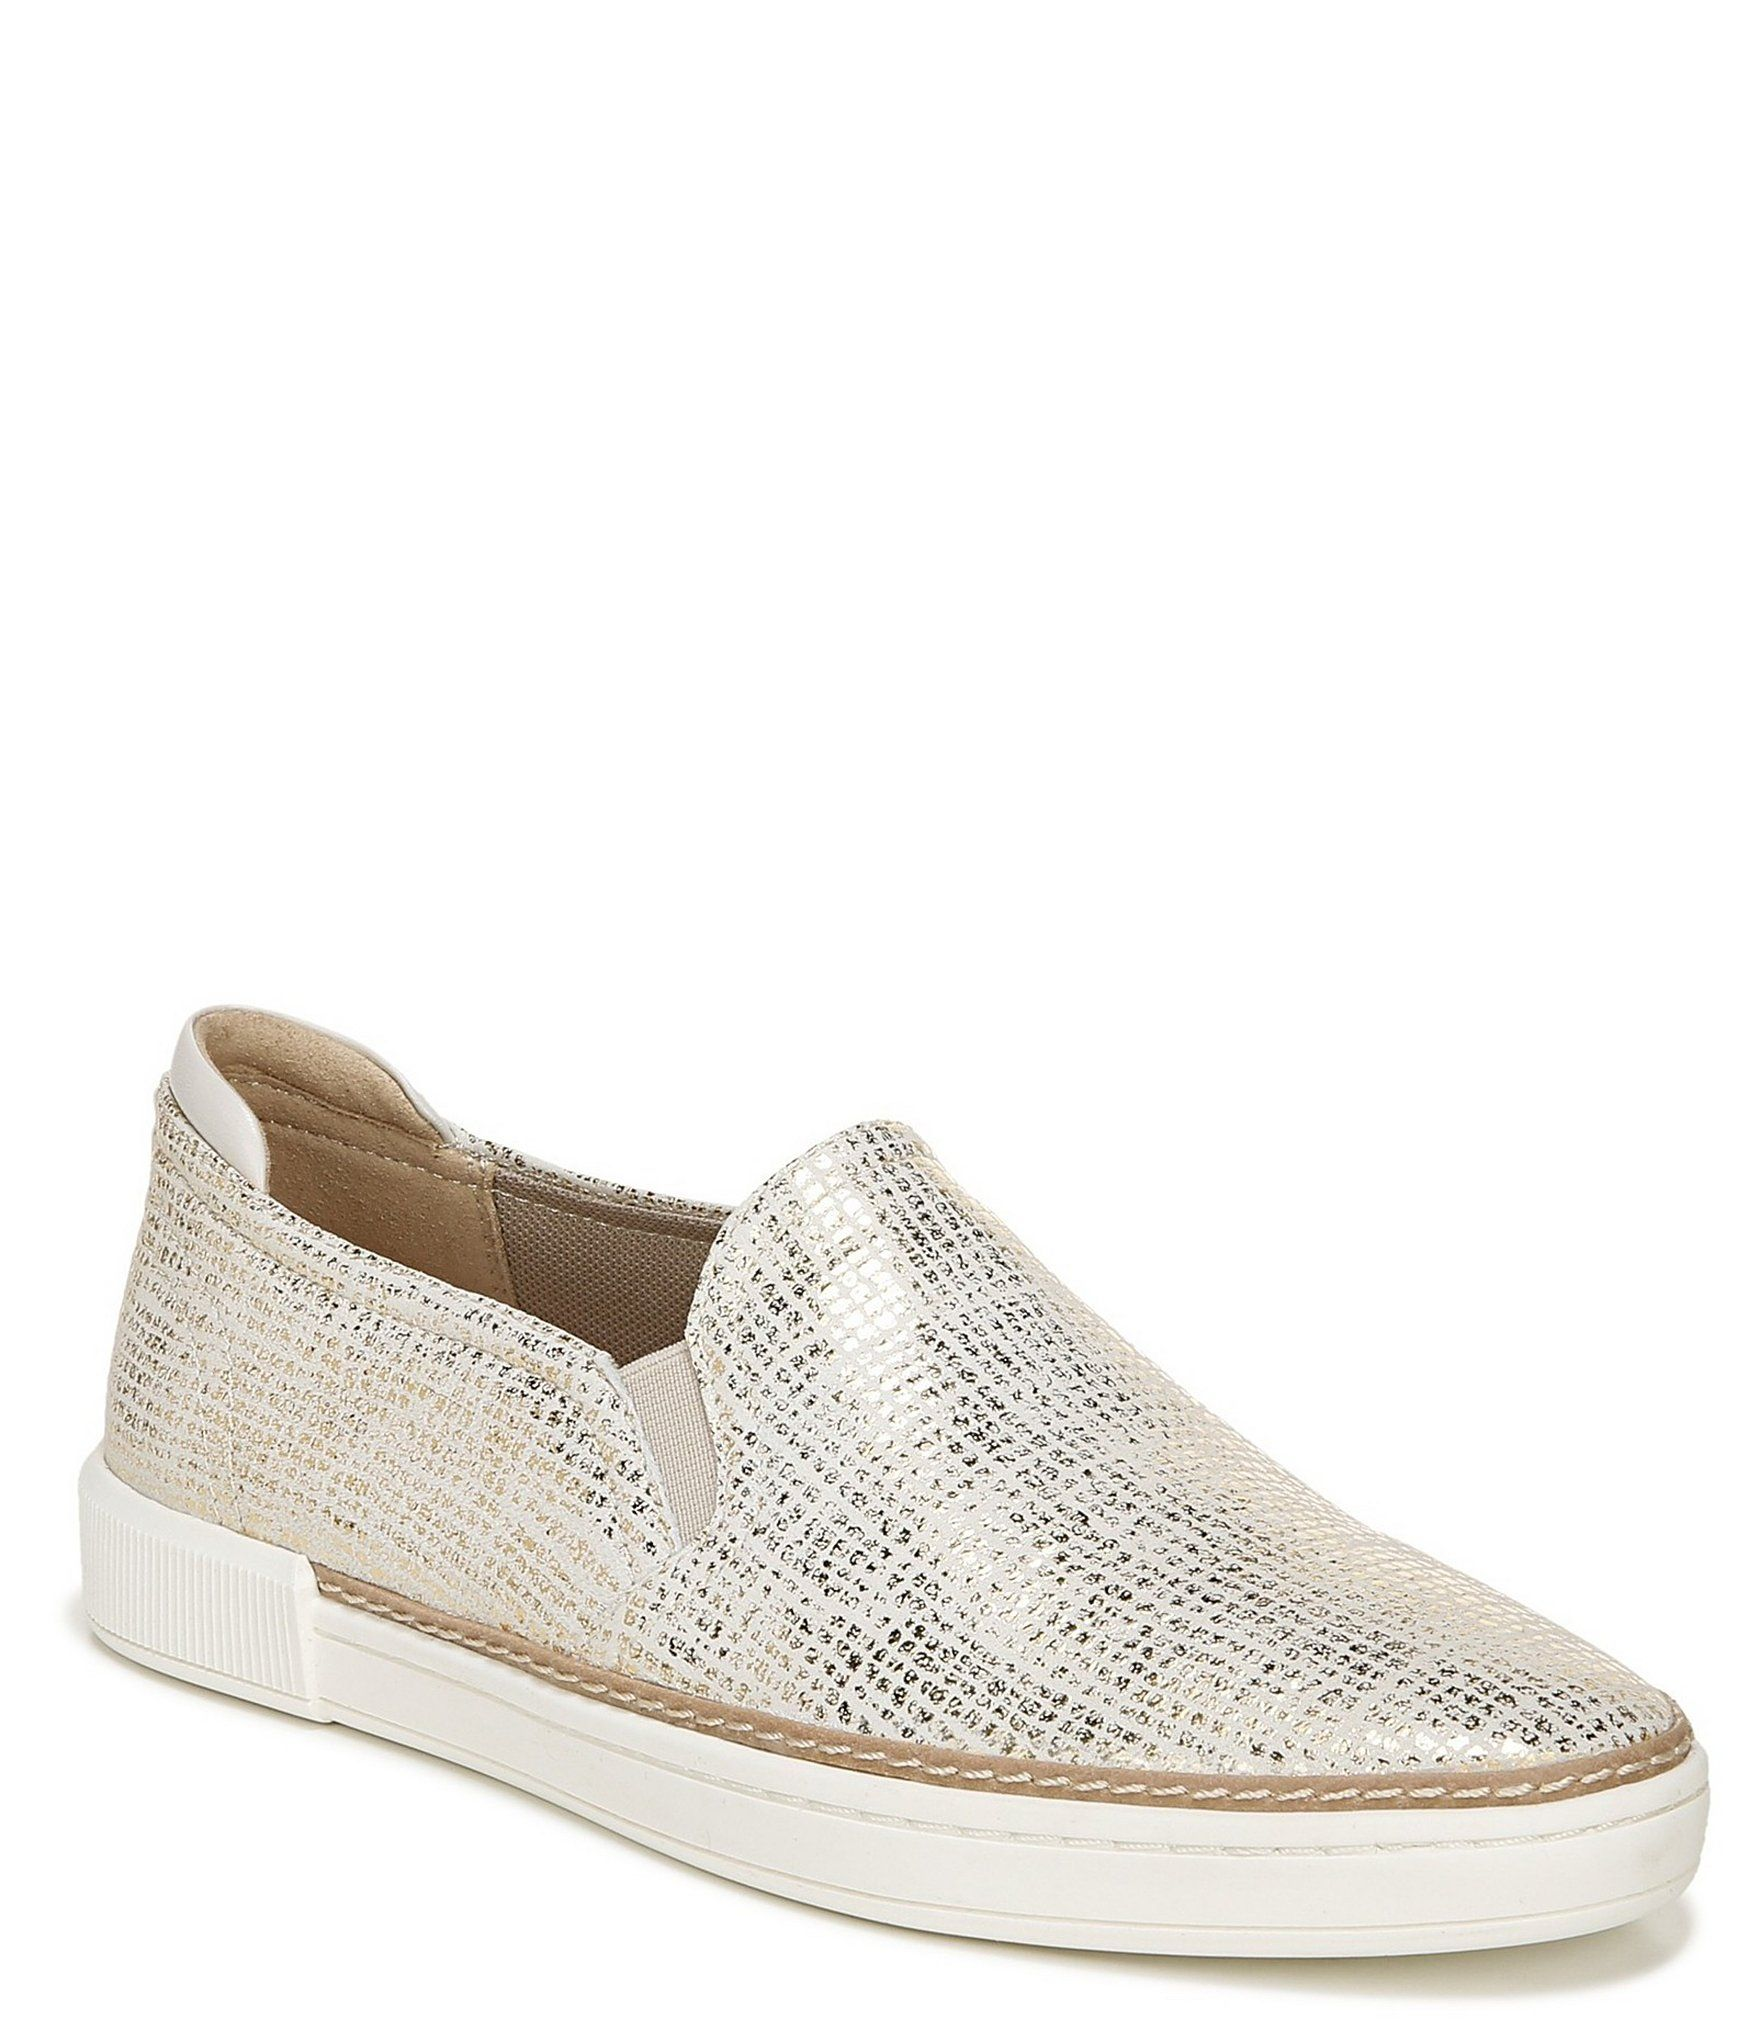 Naturalizer Jade Metallic Leather Slip On Sneakers | Dillard's